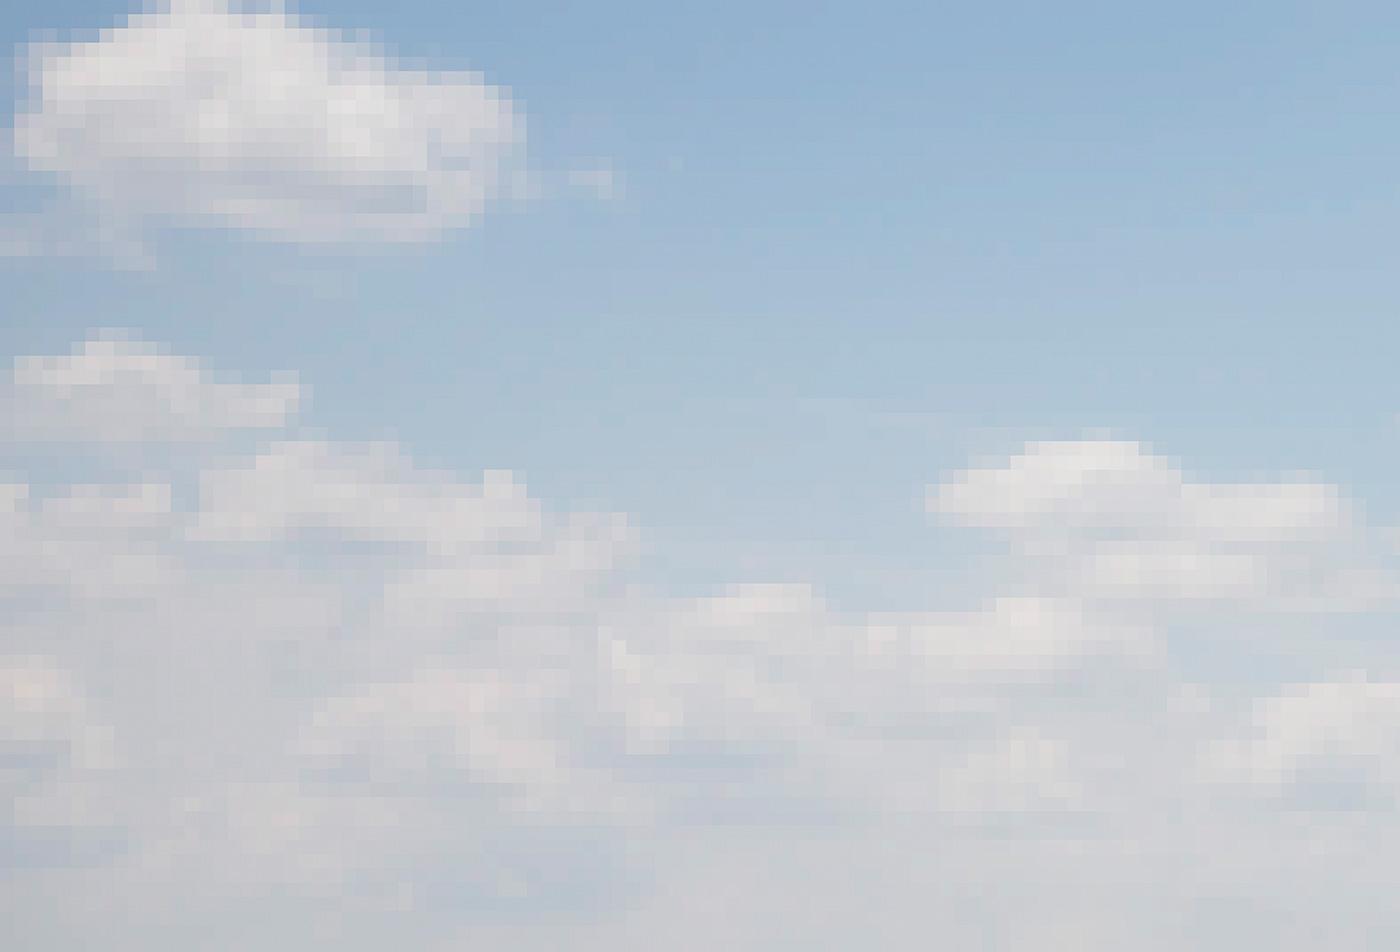 Dick Lane - Cloud Forms